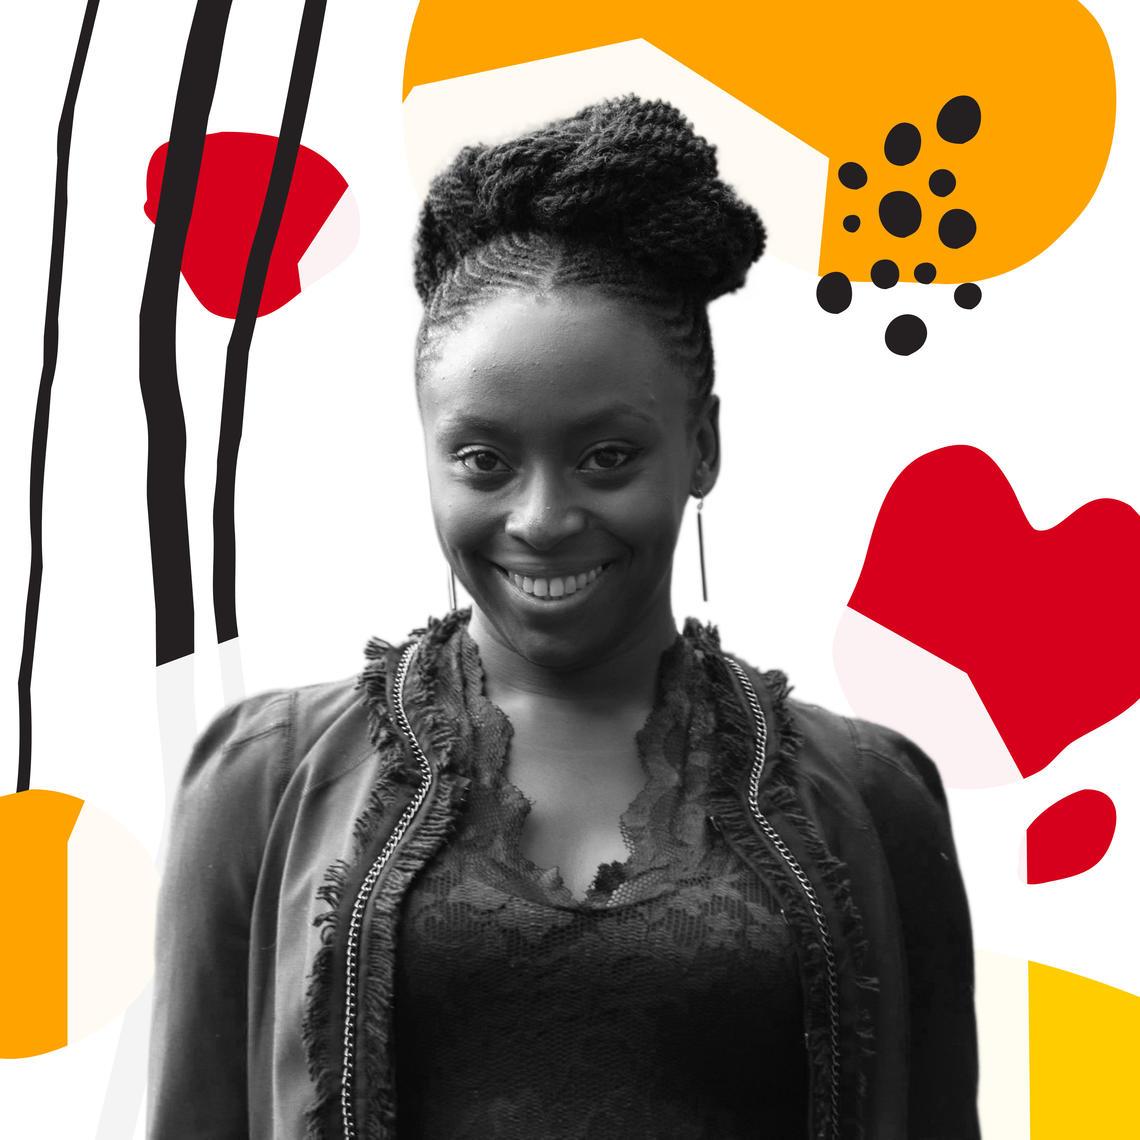 A portrait of Chimamanda Ngozi Adichie